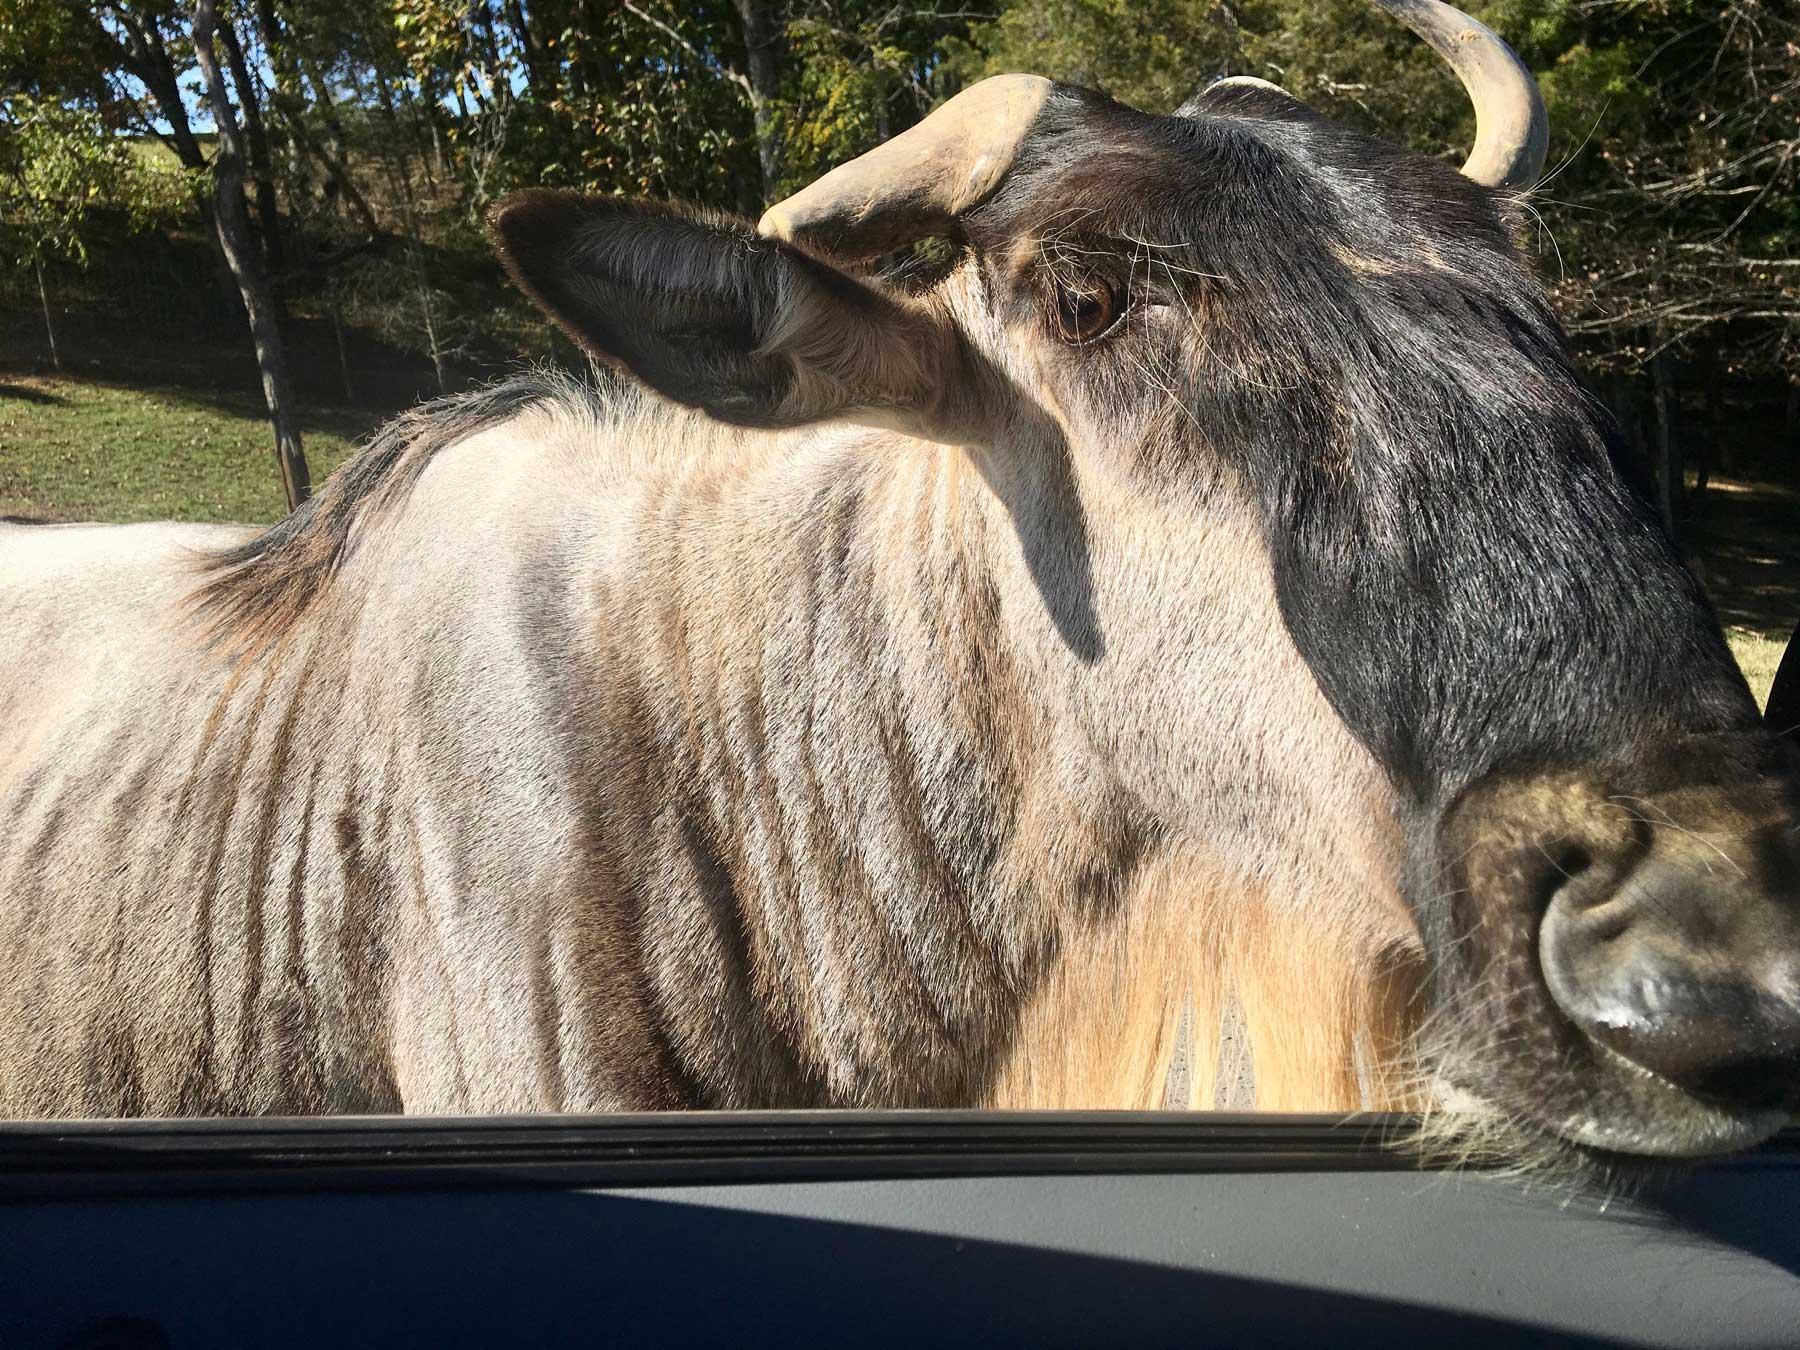 wildebeest at the car window at Virginia Safari Park, Natural Bridge, VA